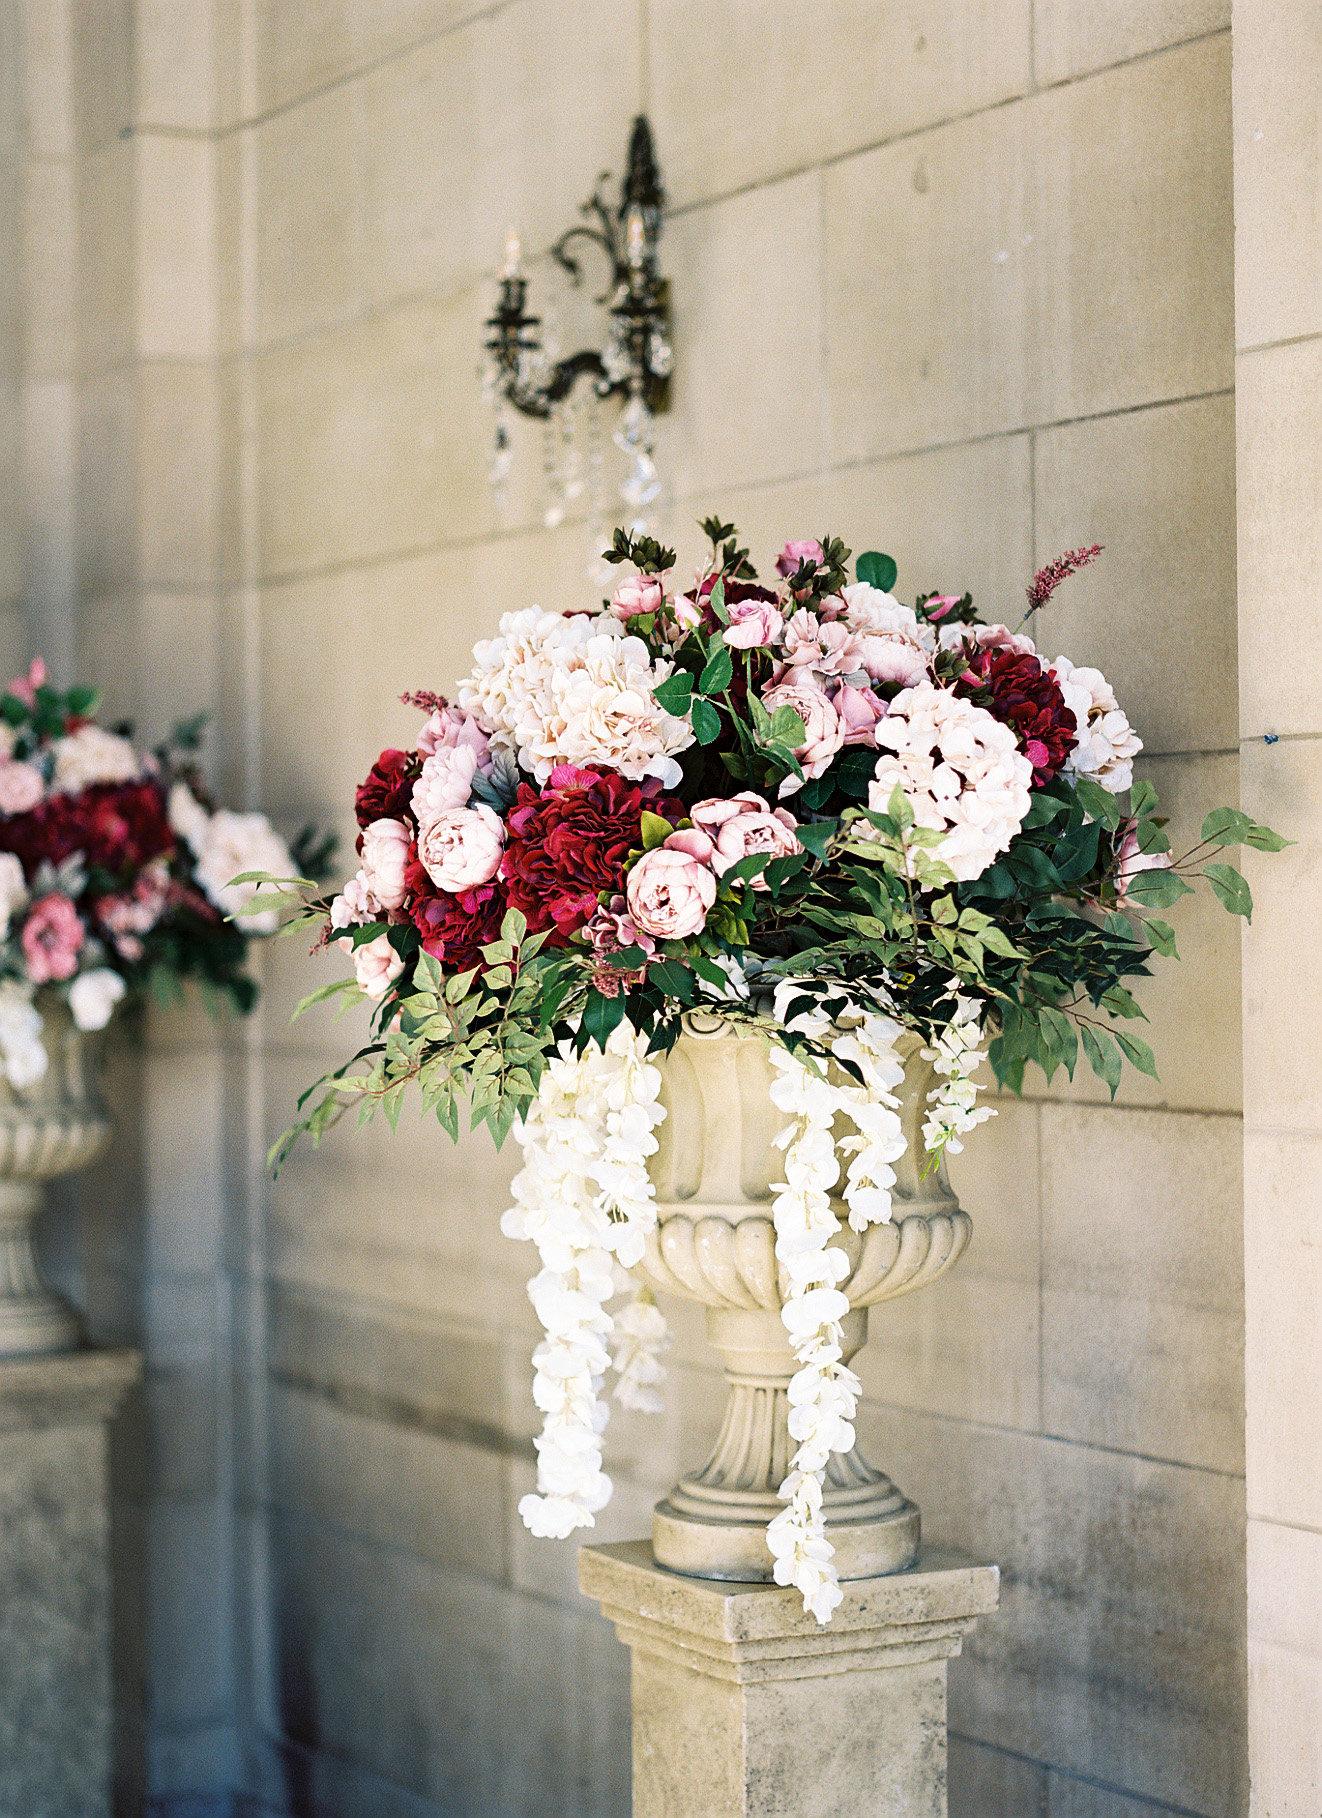 shanice & stephen wedding ceremony flowers